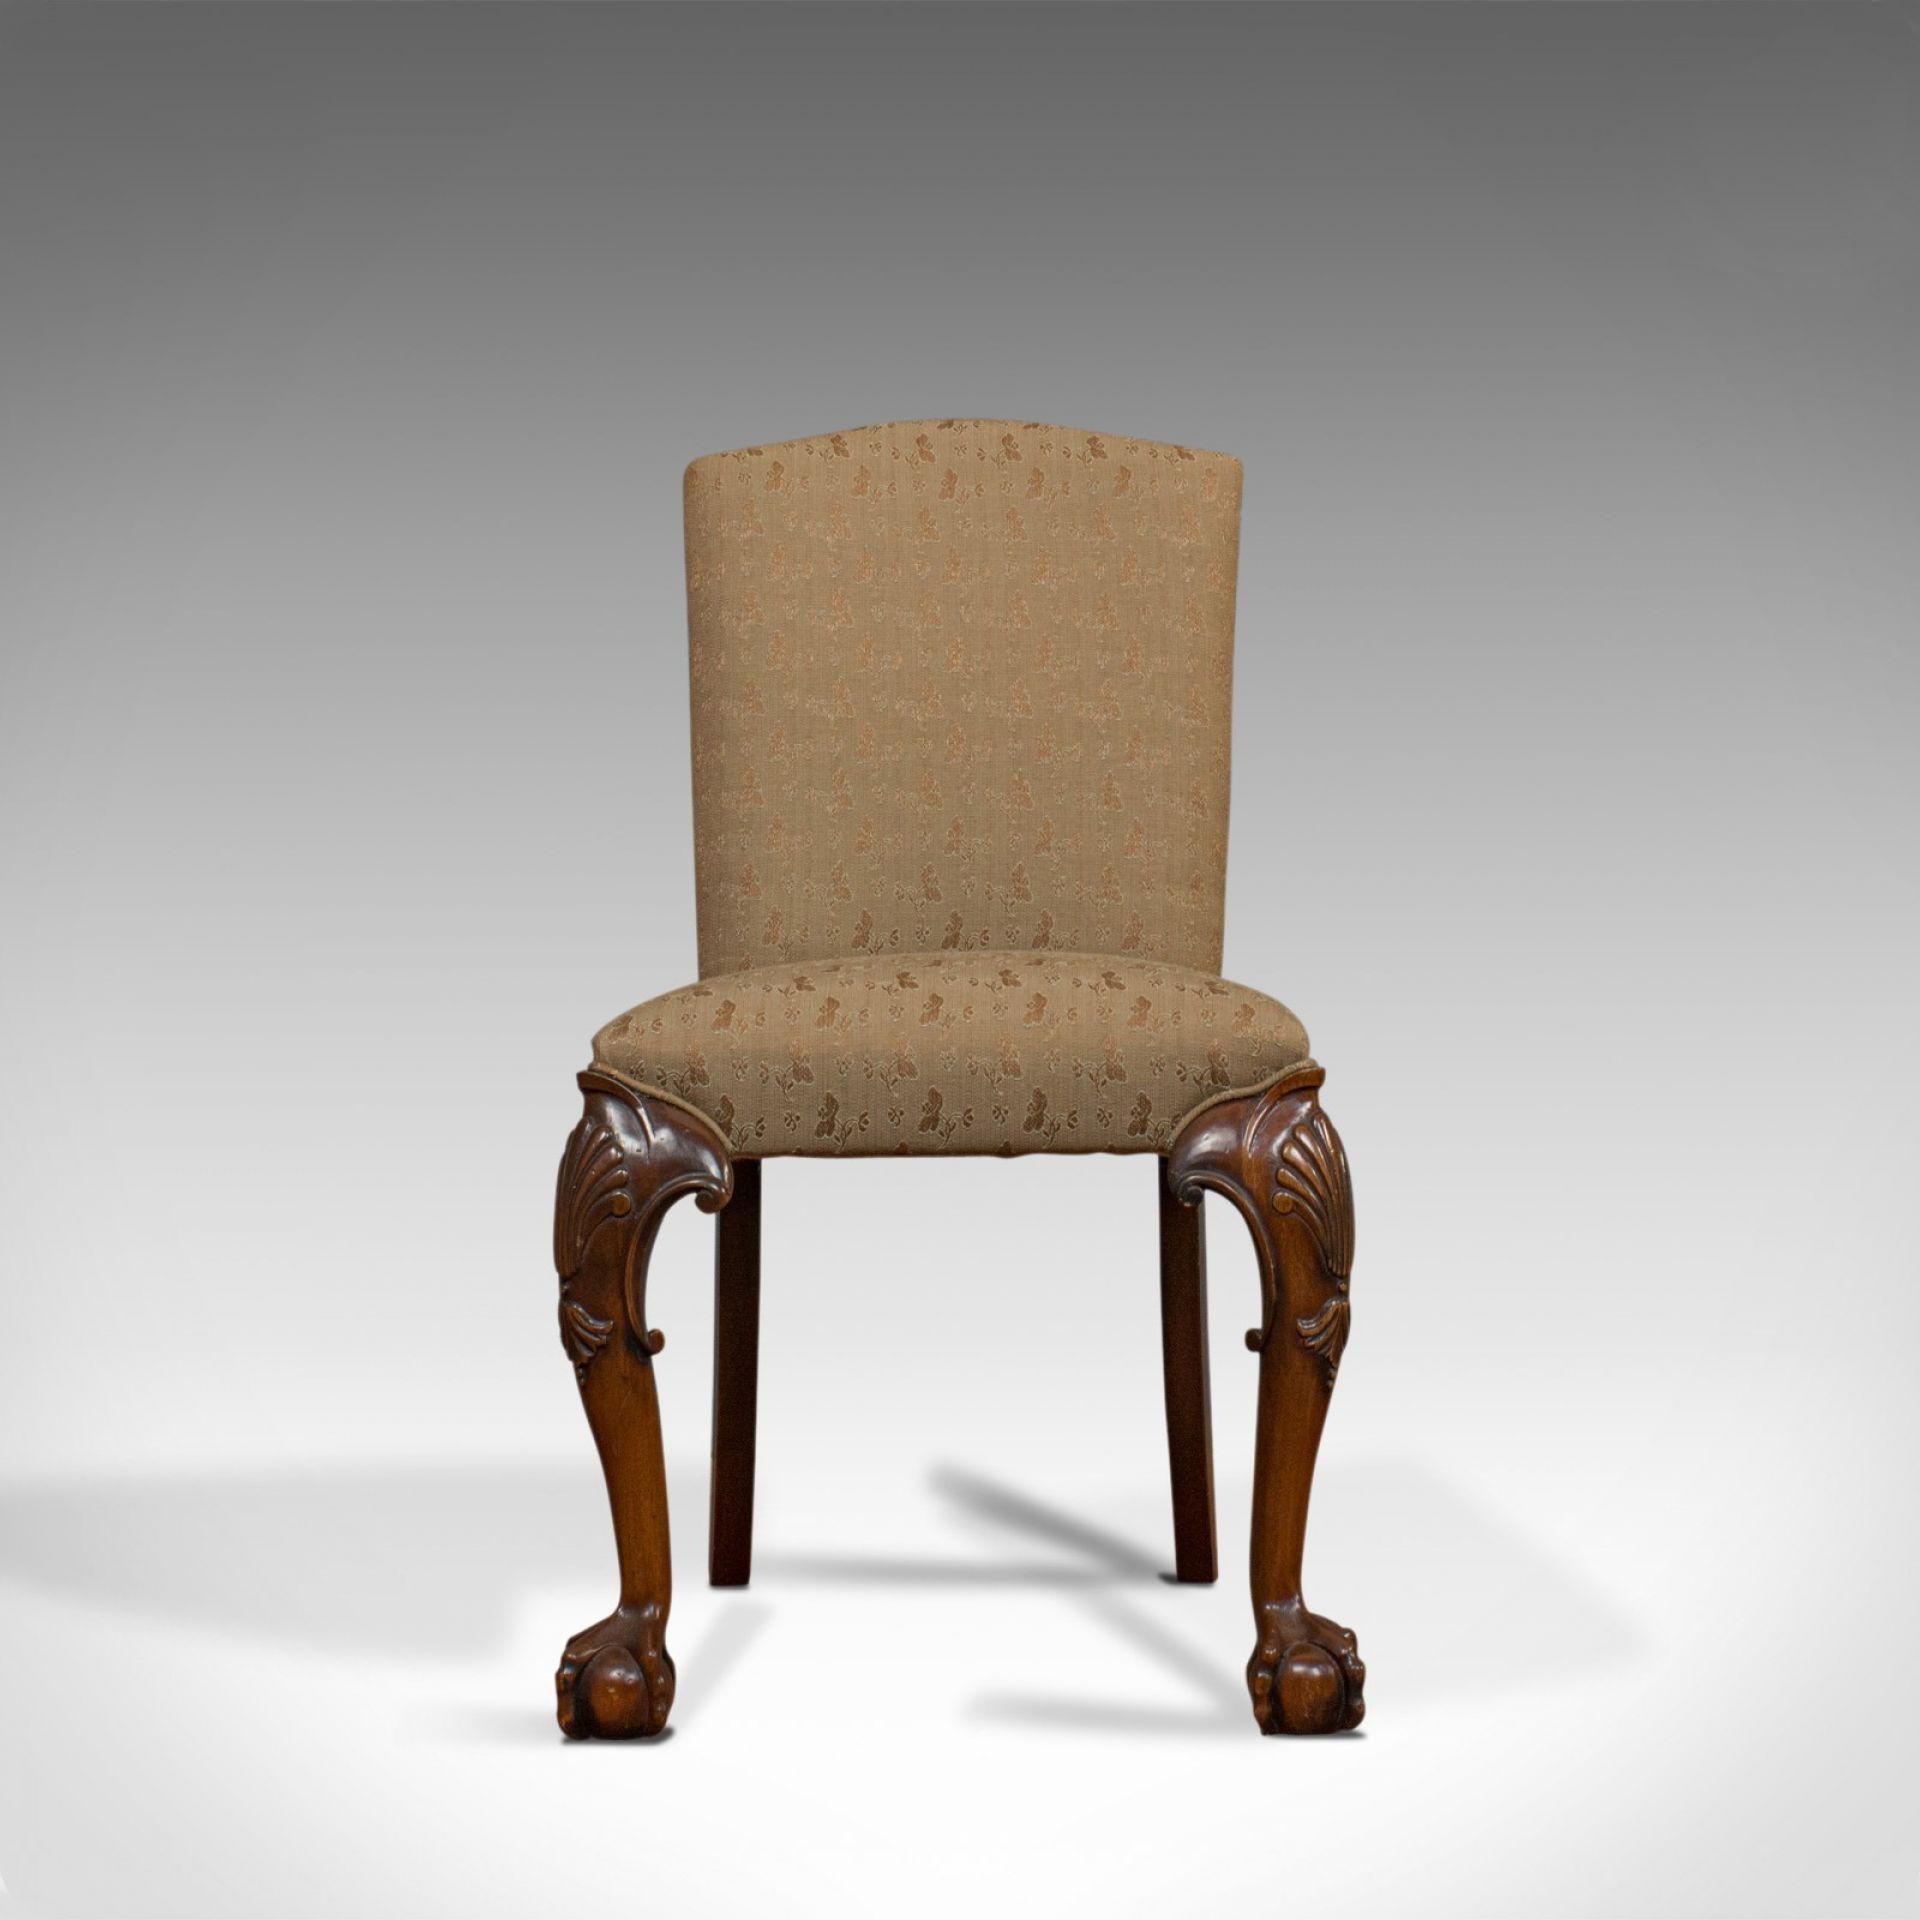 Vintage Side Chair, English, Mahogany, Georgian Revival, Drawing Room